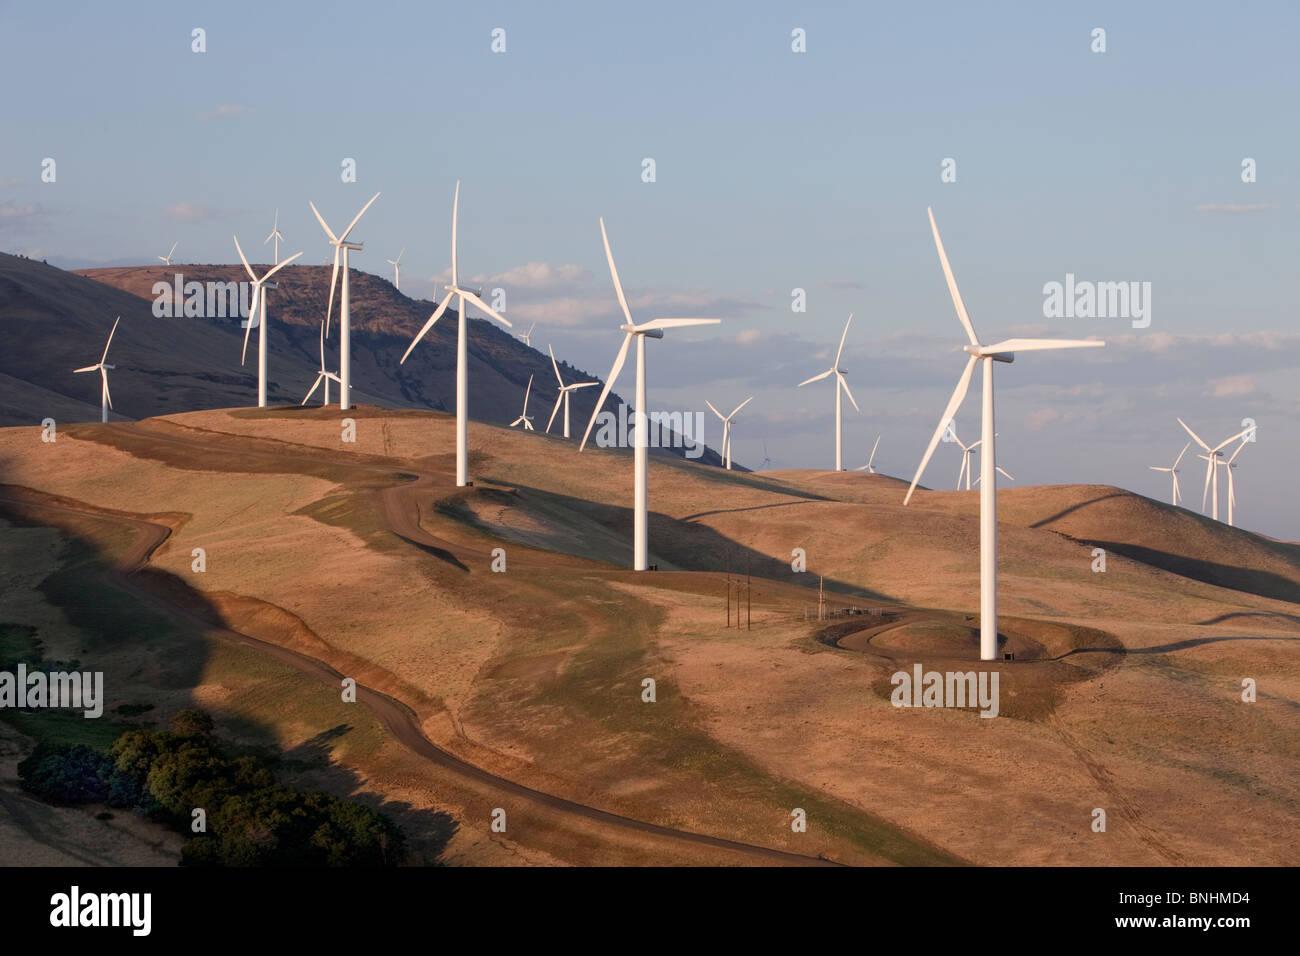 Windpark, einheimische Flora, Stockbild